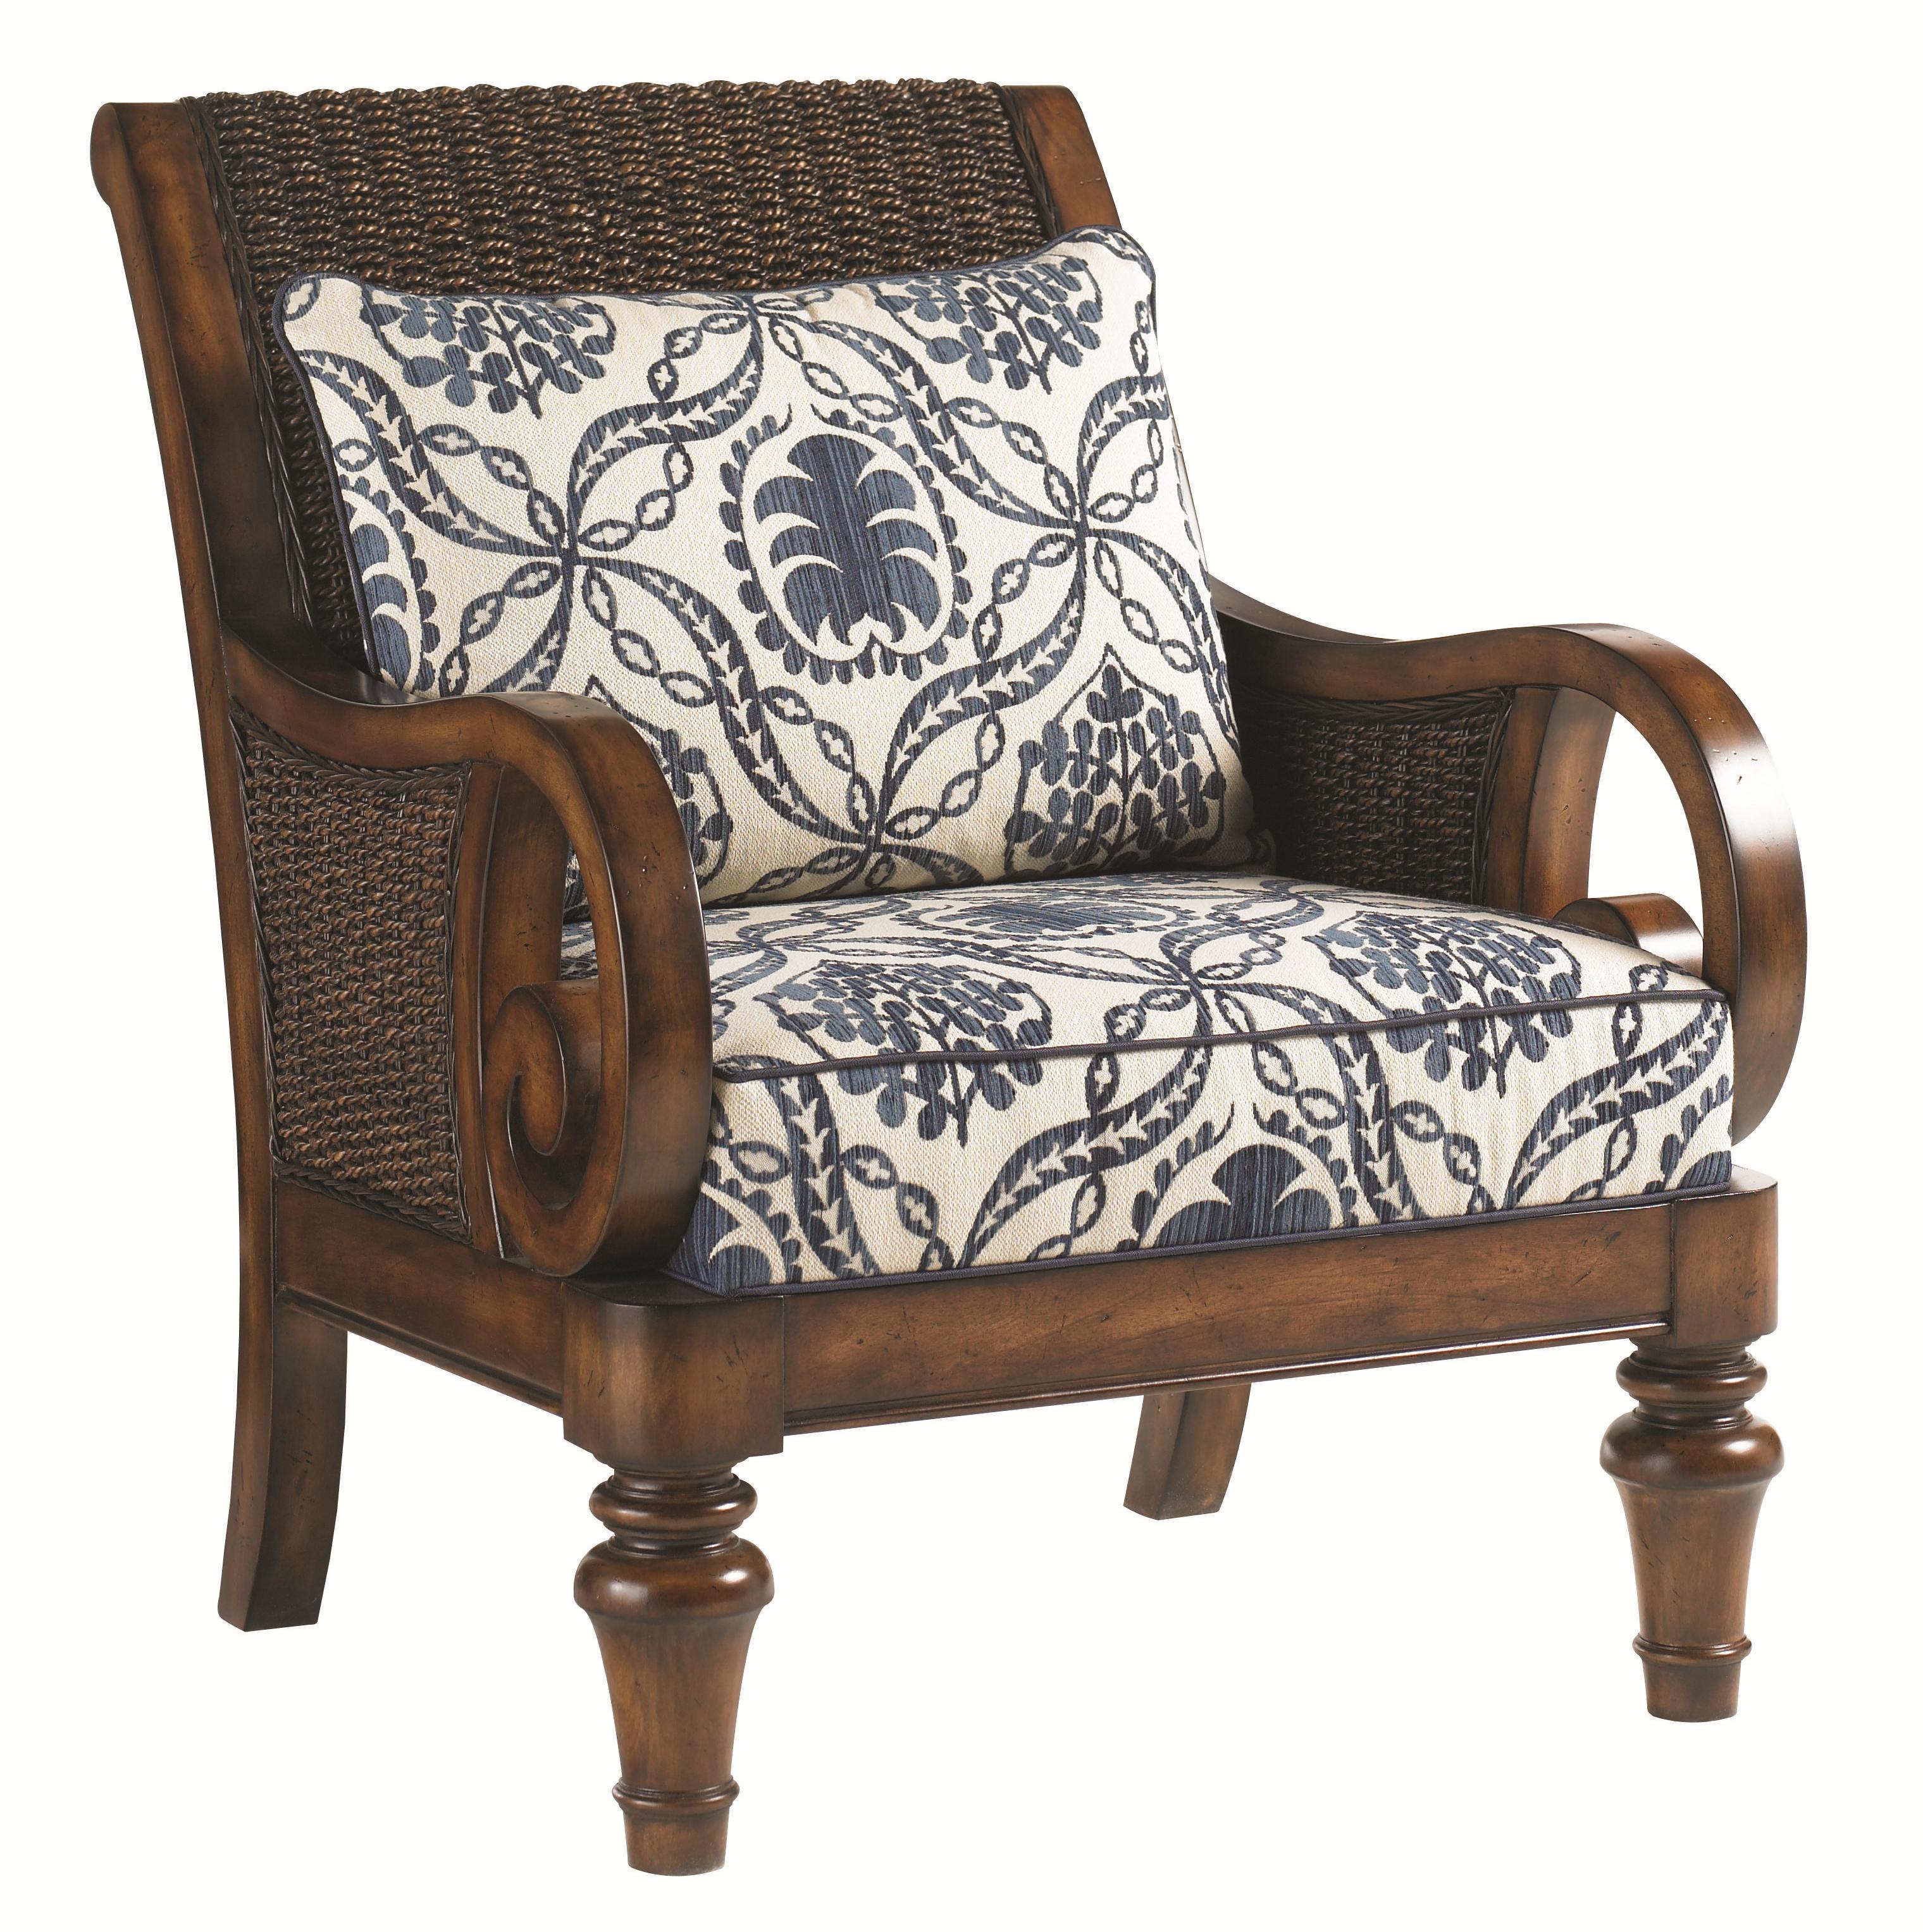 Lexington Lexington Upholstery Marin Chair Loose Back Water Hyacanith Chair Belfort